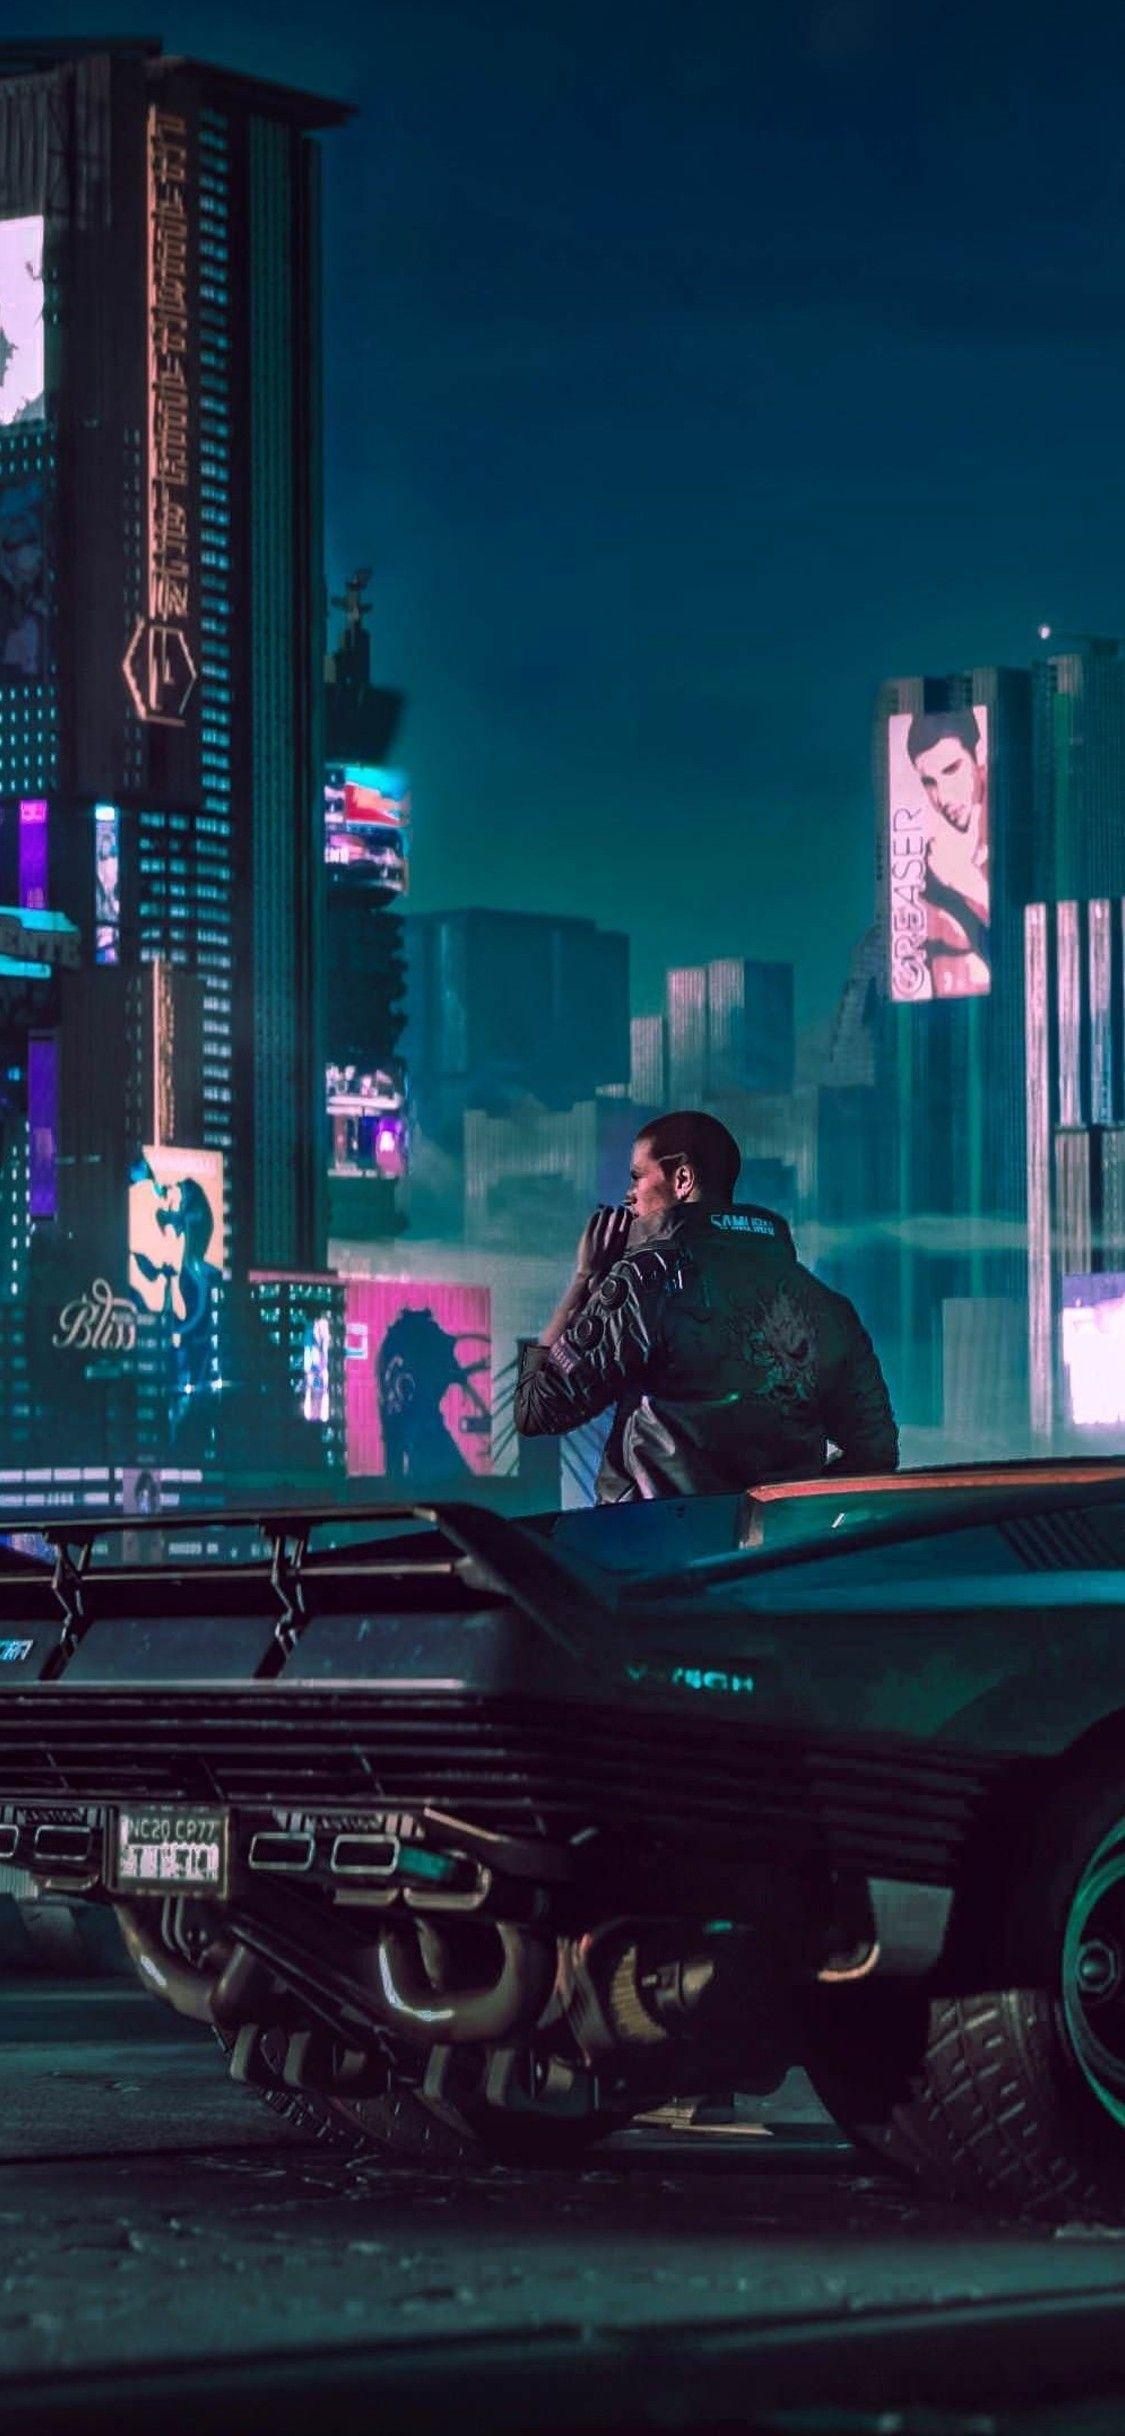 1440p Cyberpunk 2077 Wallpaper : 1440p, cyberpunk, wallpaper, Cyberpunk, Wallpapers, Backgrounds, WallpaperAccess